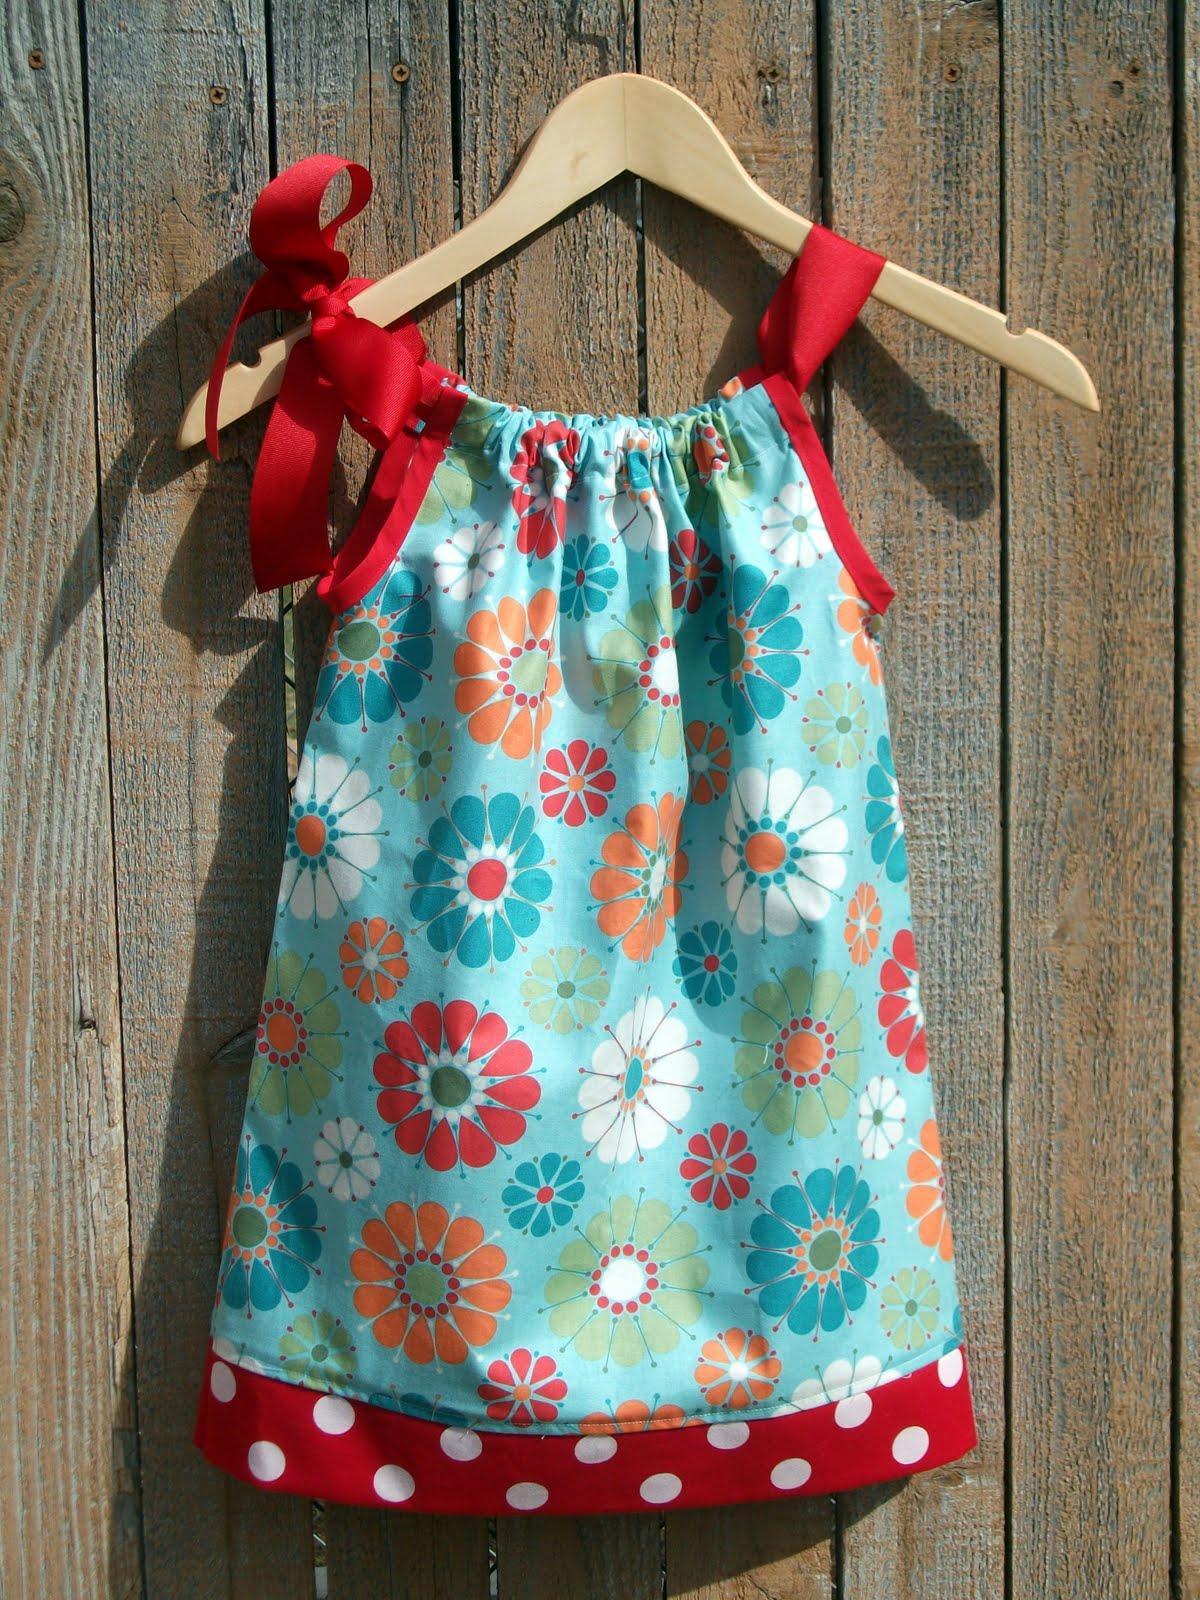 Little Inspirations Adorable Pillowcase Dresses